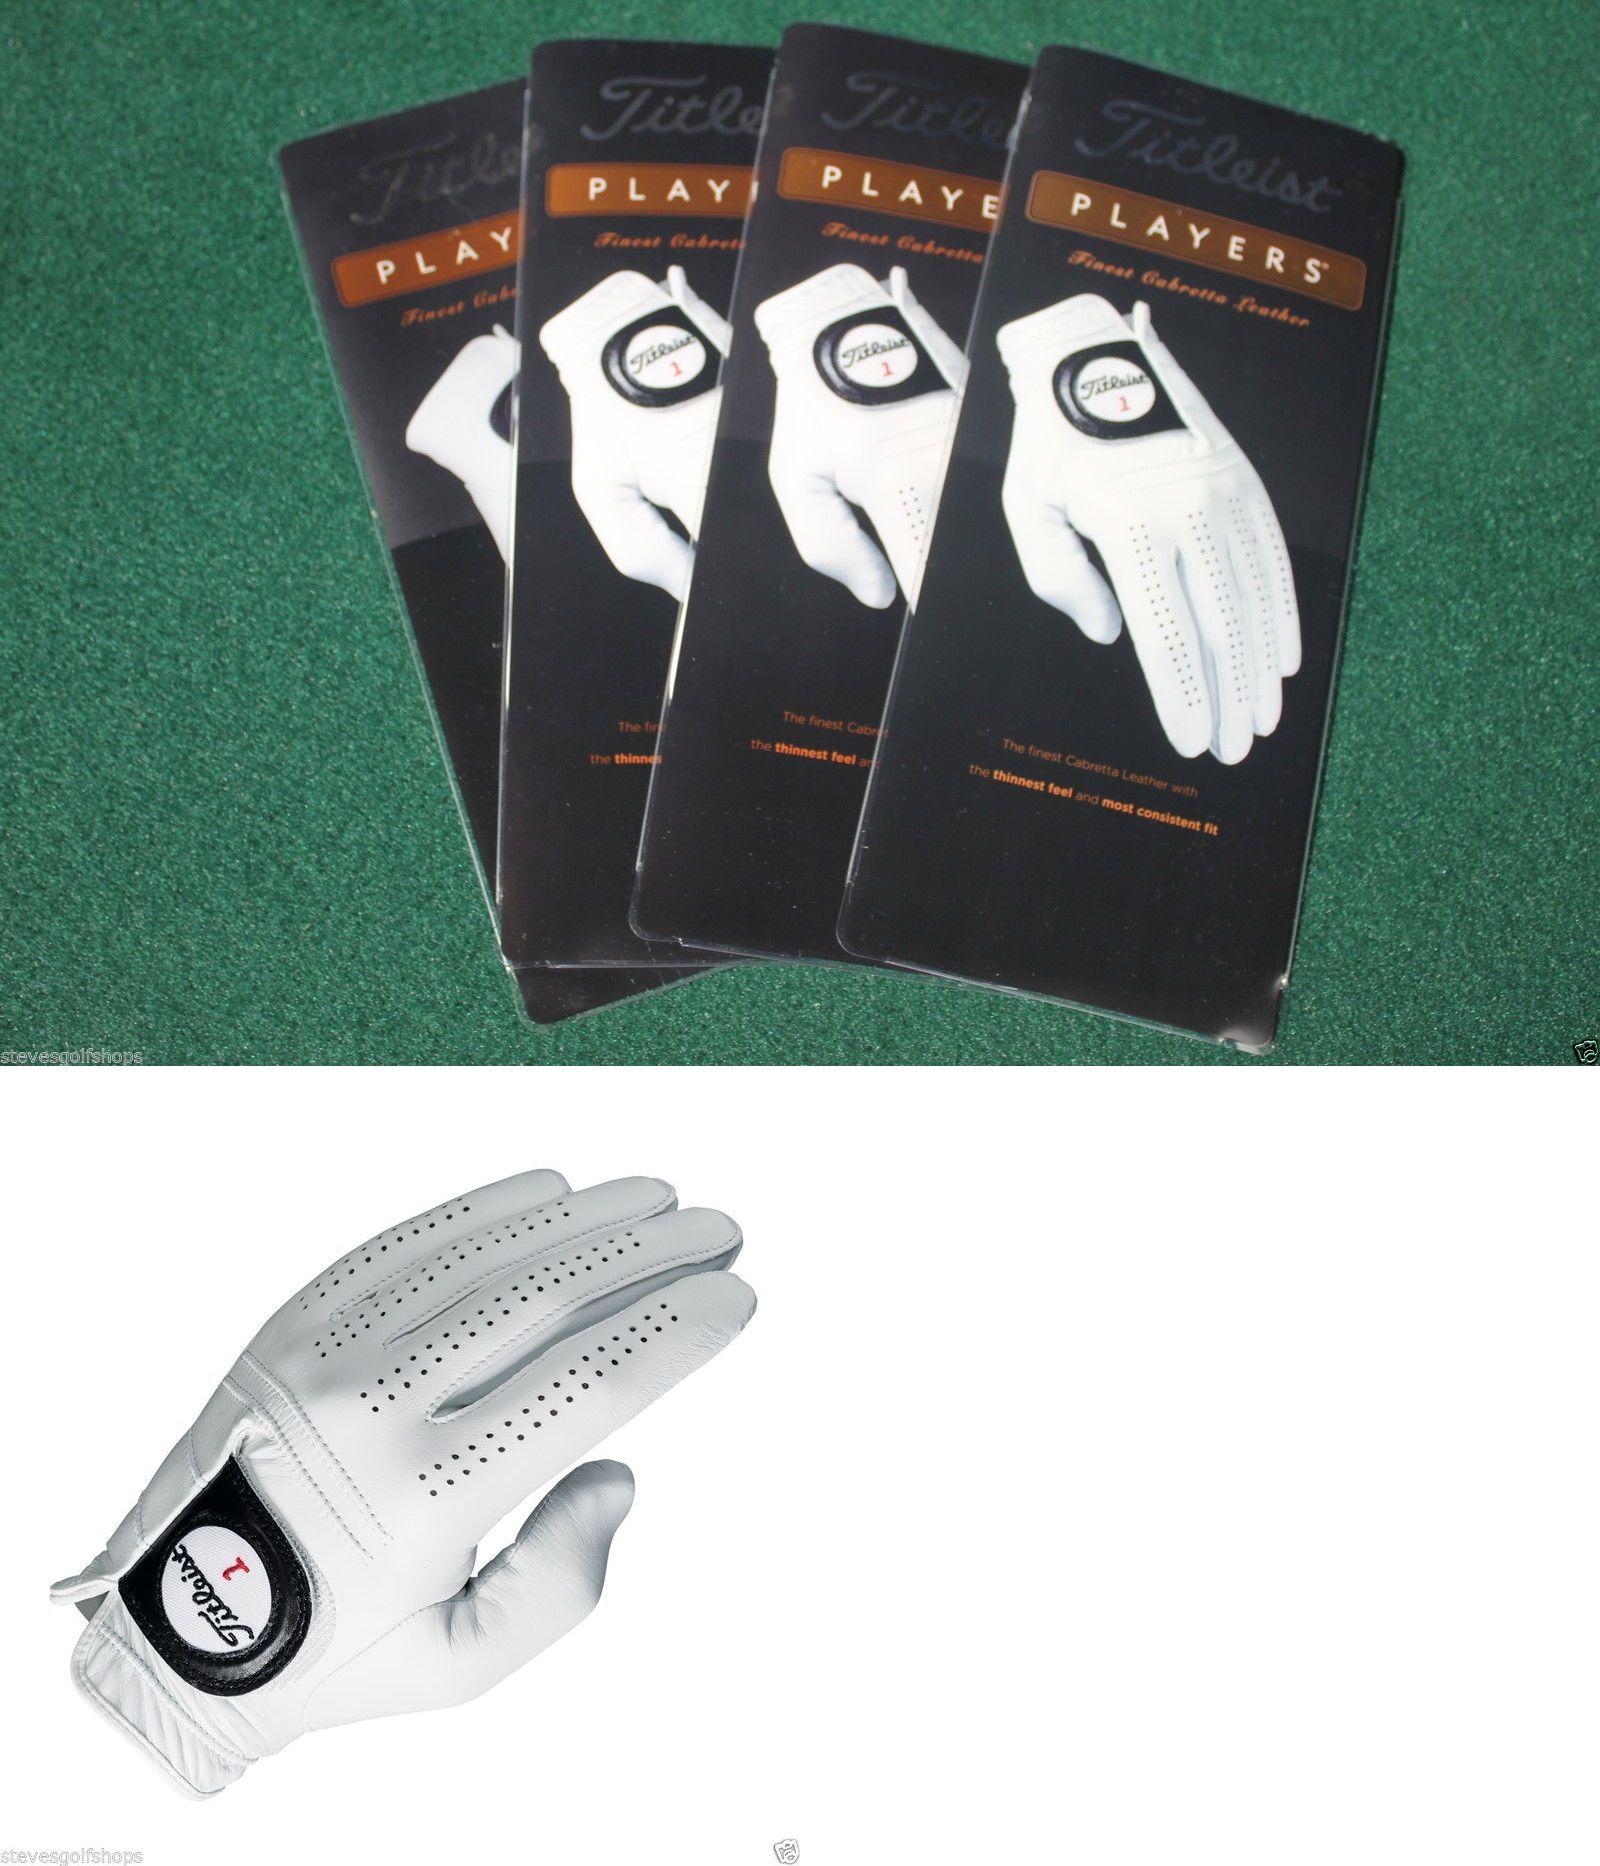 Mens gloves cadet - Golf Gloves 181135 4 New 2016 Titleist Players Golf Gloves Mens Cadet Medium W